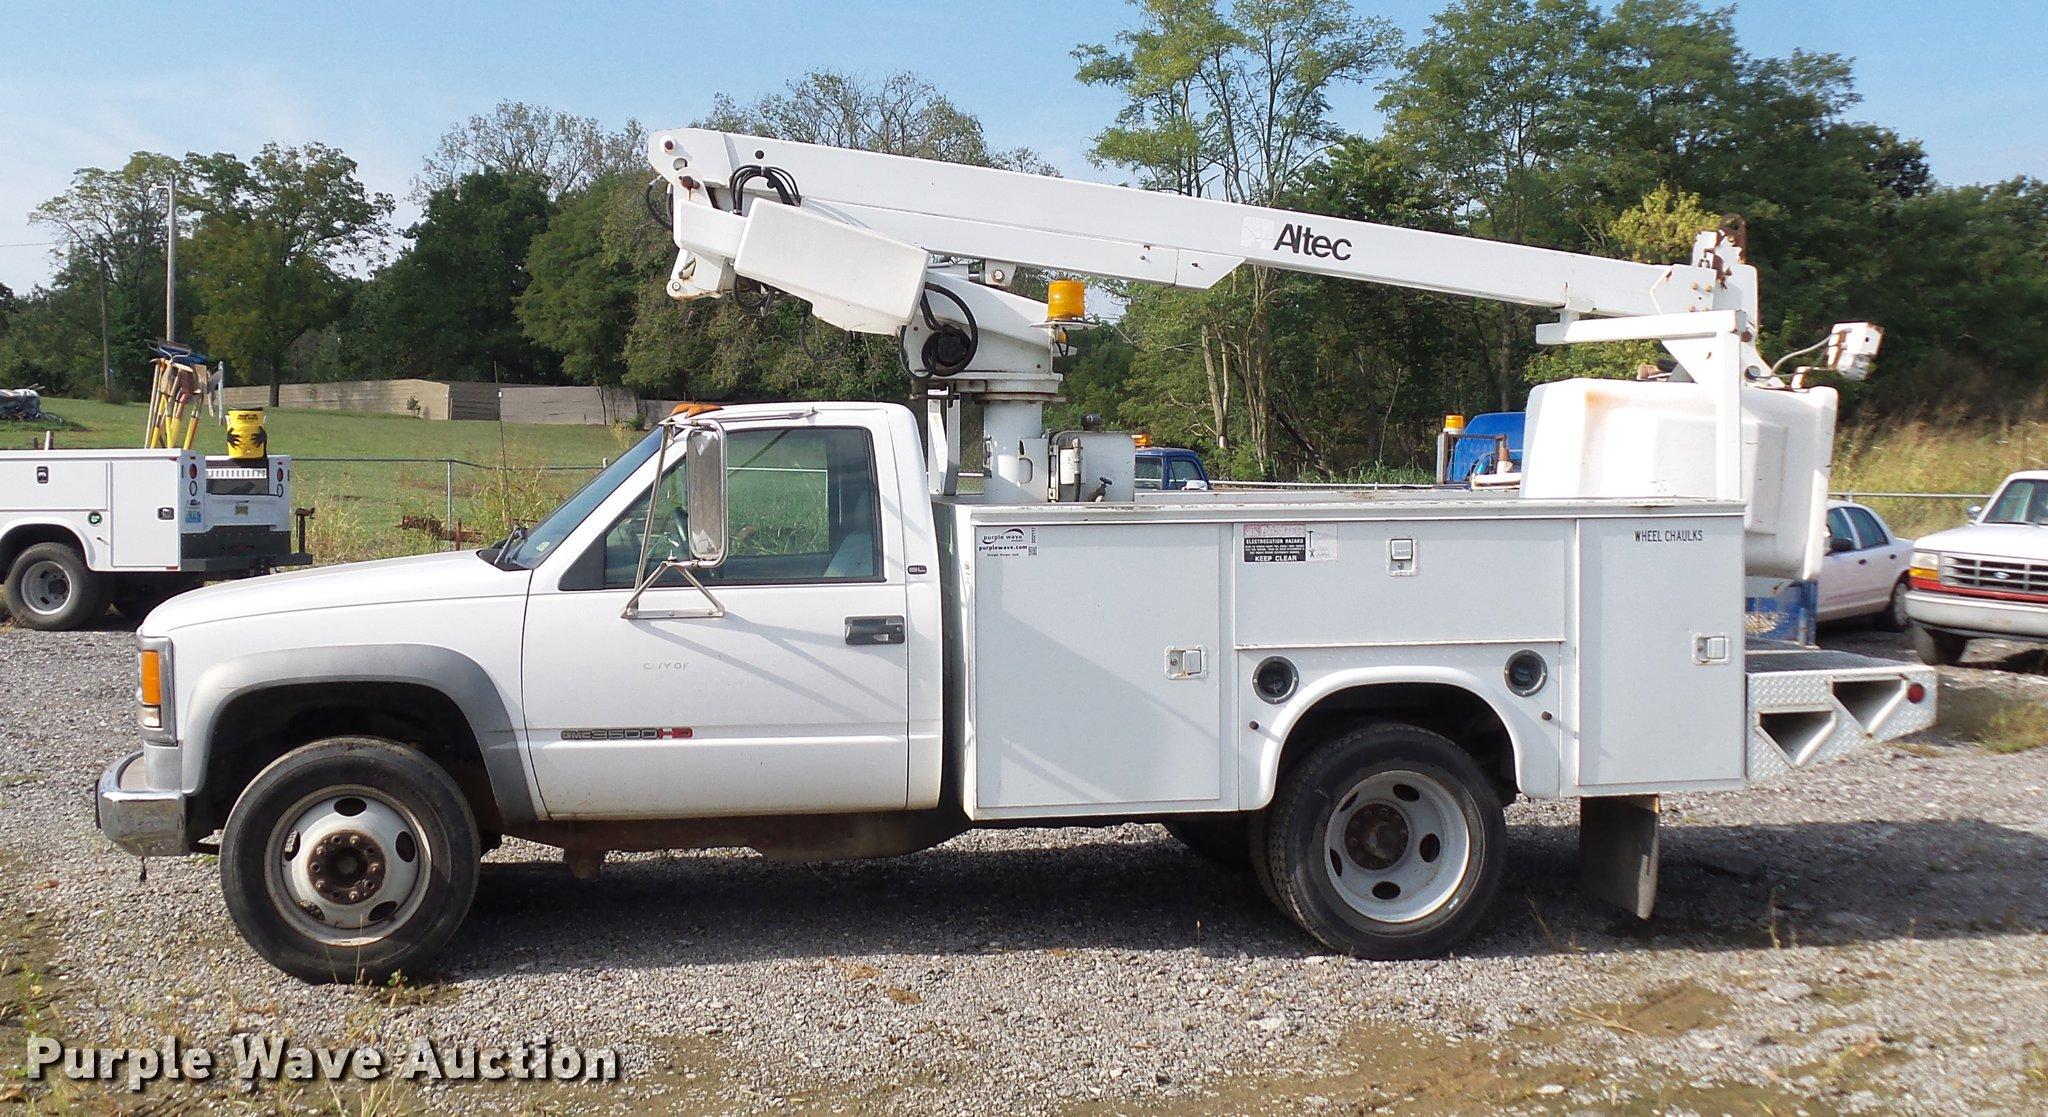 altec bucket trucks wiring diagrams 1999 gmc sierra 3500 bucket truck item dd2117 10 26 2017  1999 gmc sierra 3500 bucket truck